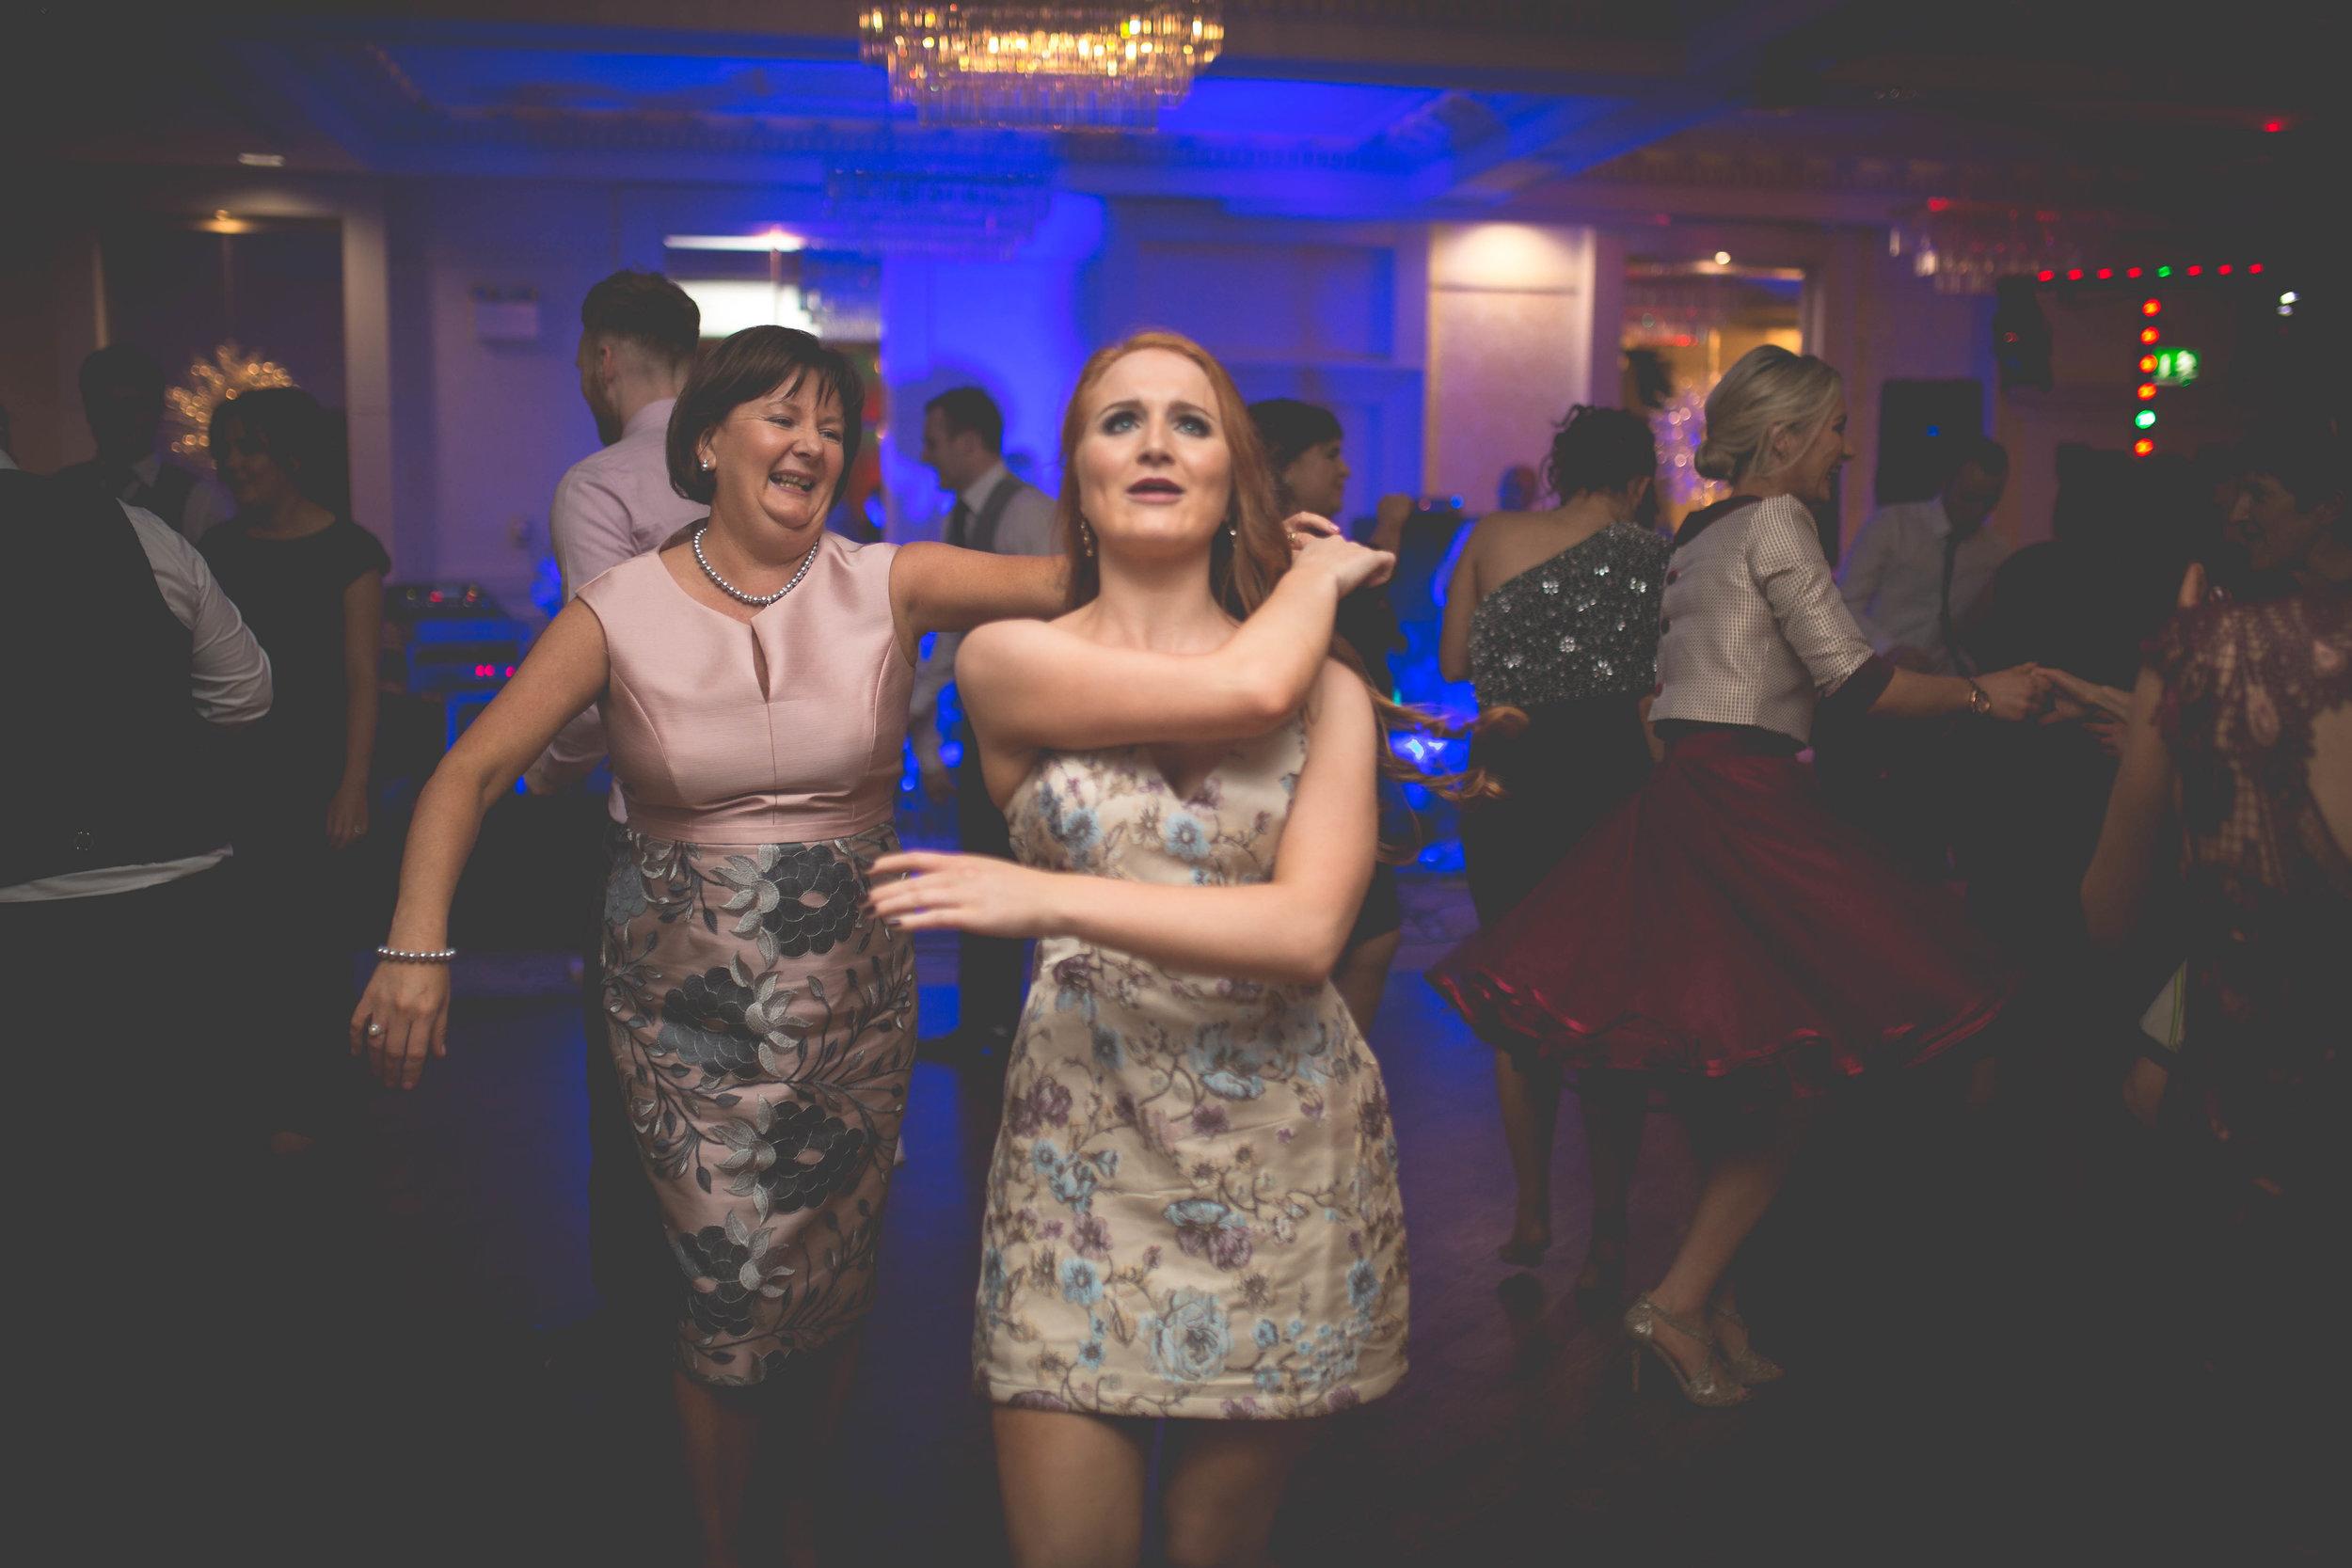 MaryJo_Conor_Mageean_Dancing-18.jpg